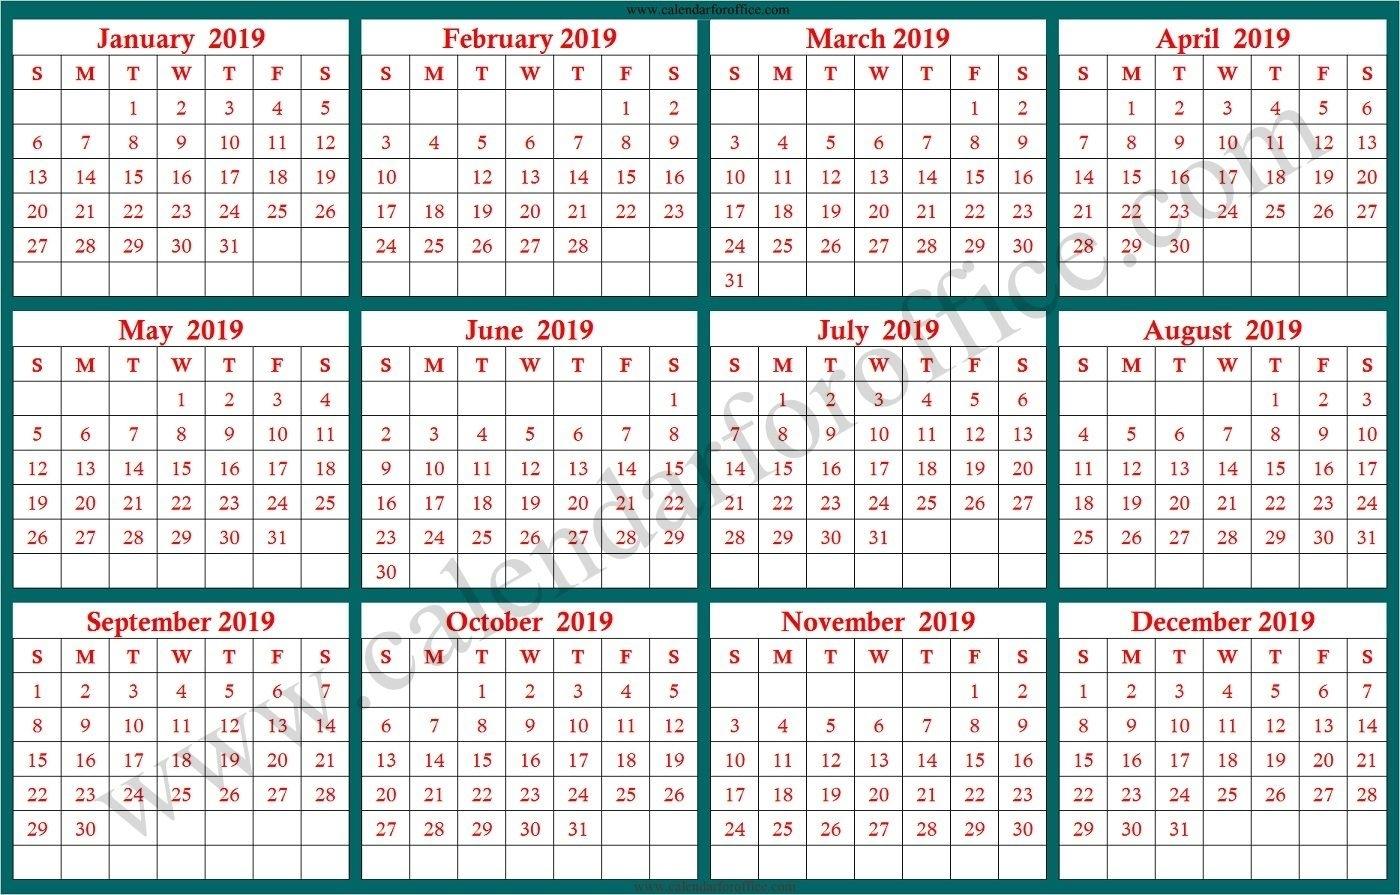 019 Year Calendar Bangla | Calendar, 2019 Calendar, Yearly pertaining to 2020 Year Calendar Printable Free Bangla